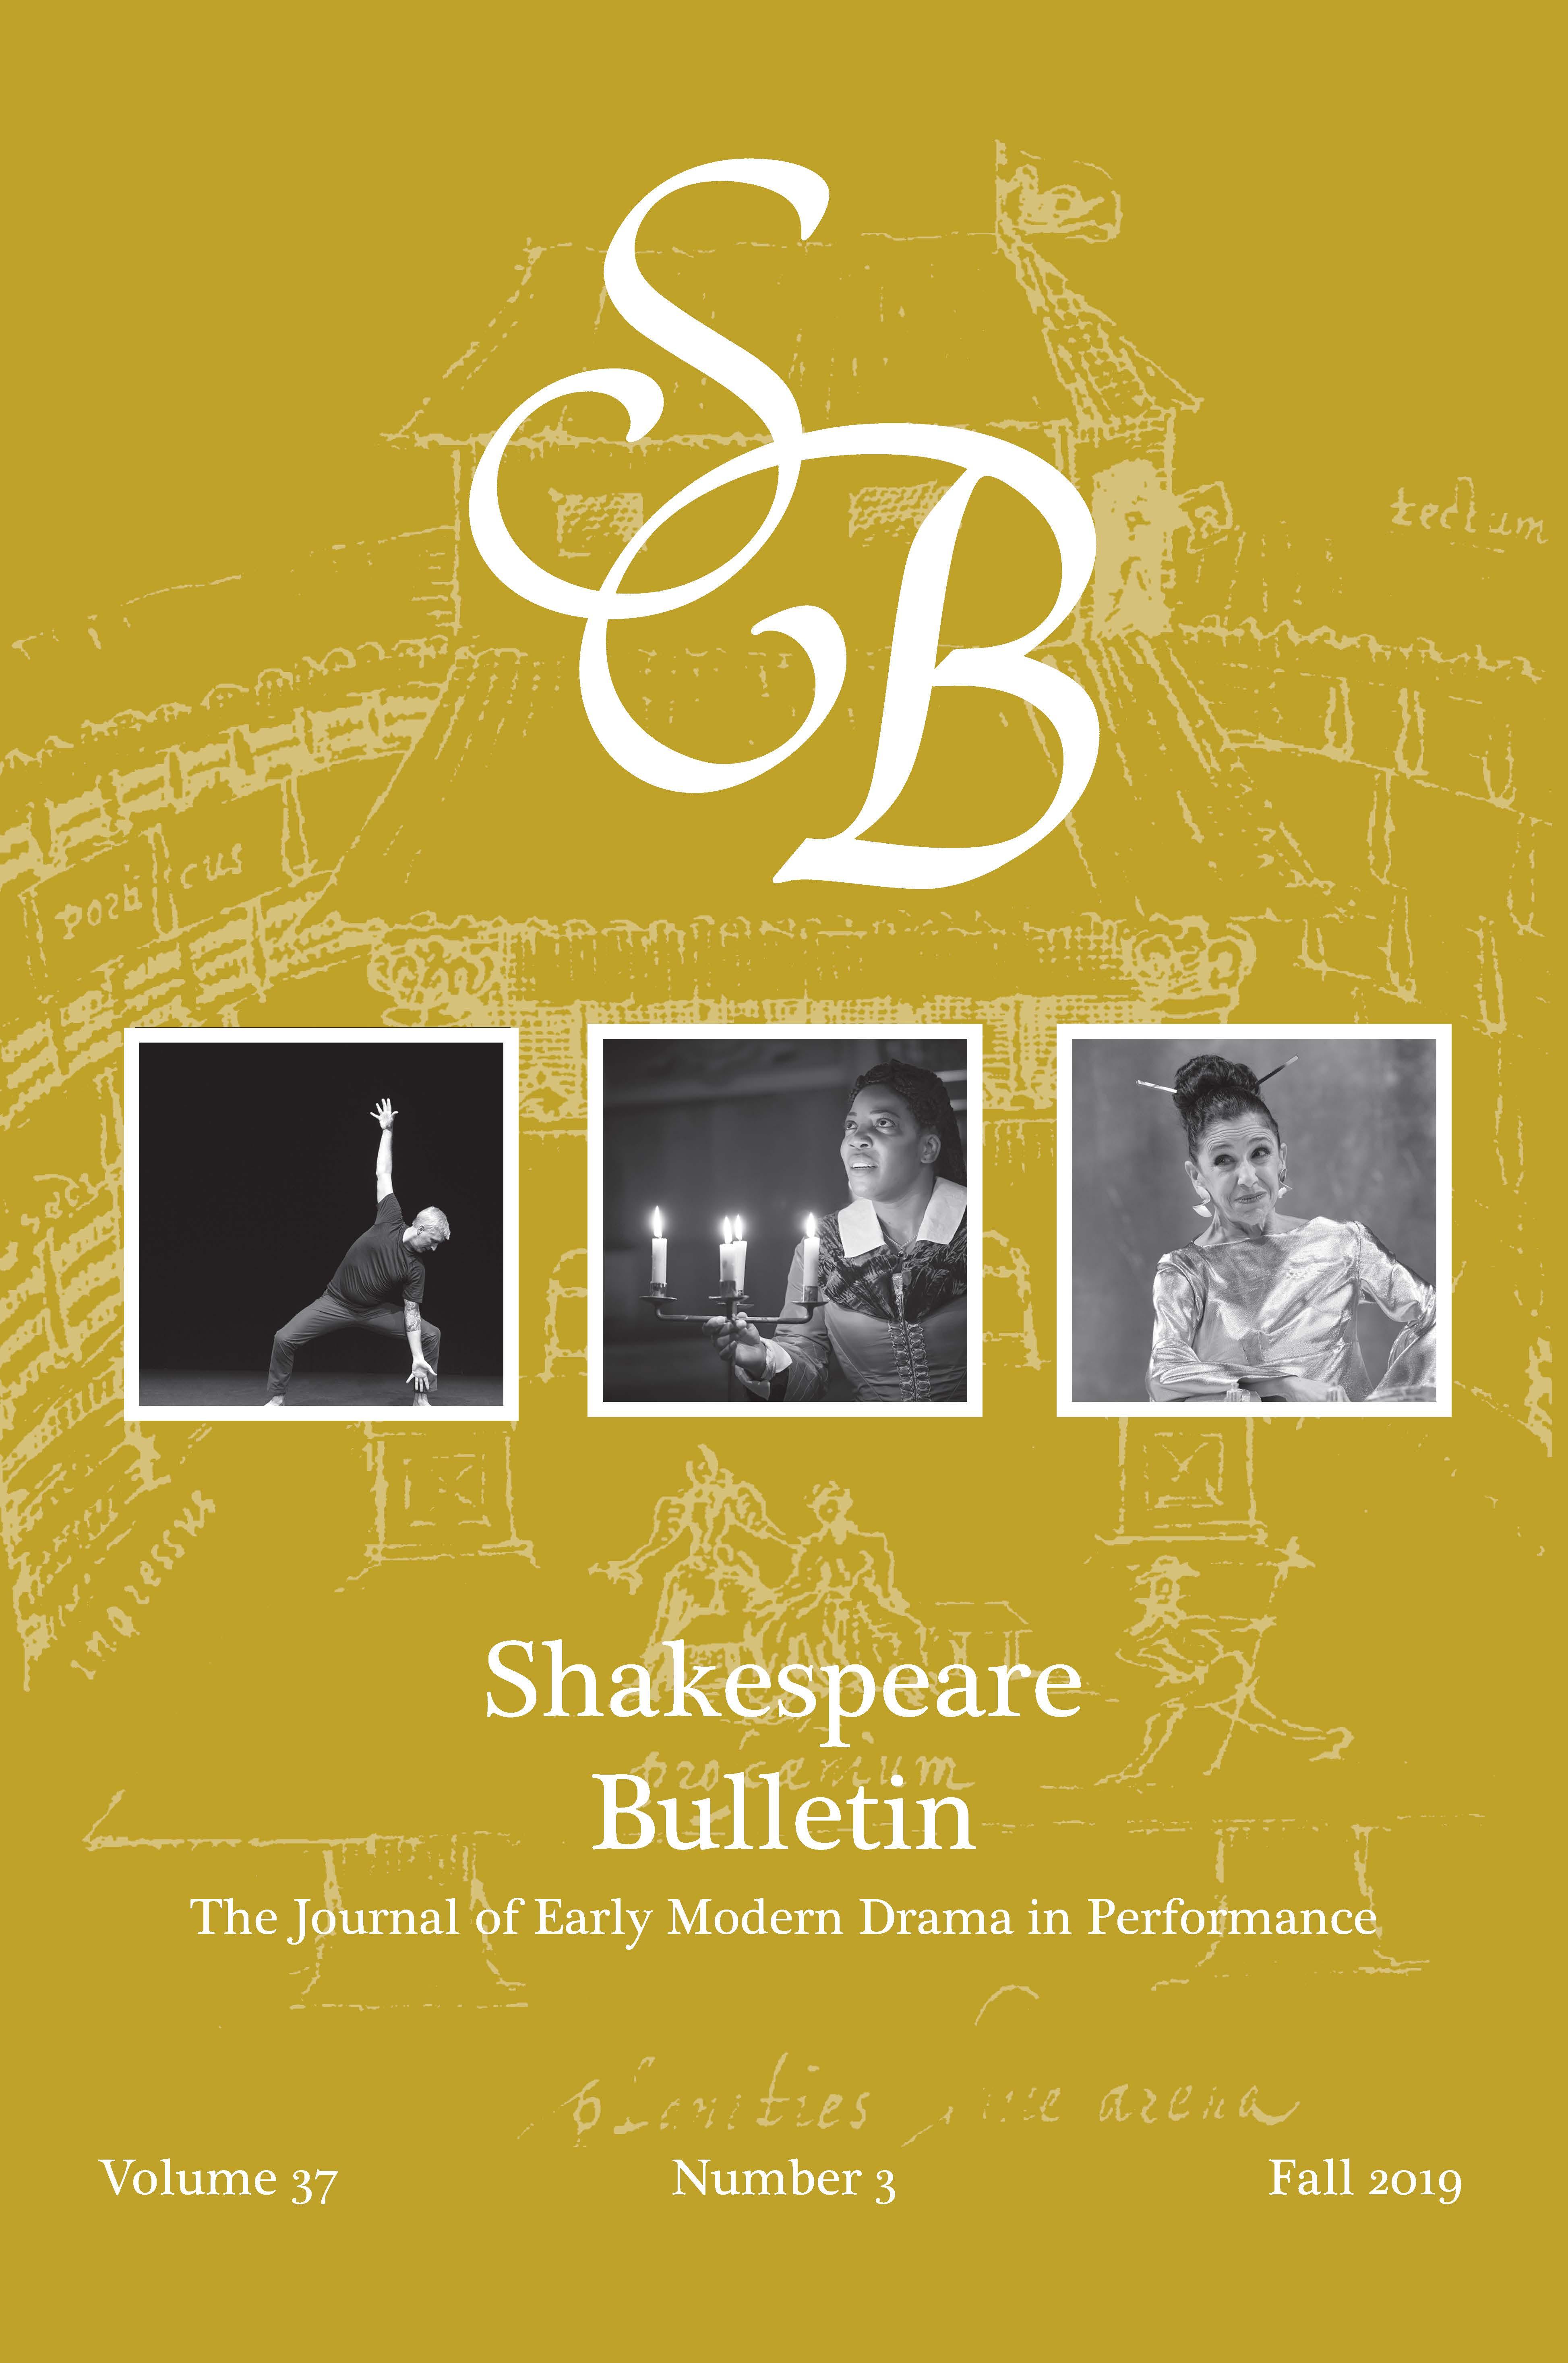 Shakespeare Bulletin: Volume 37, Number 3, Fall 2019